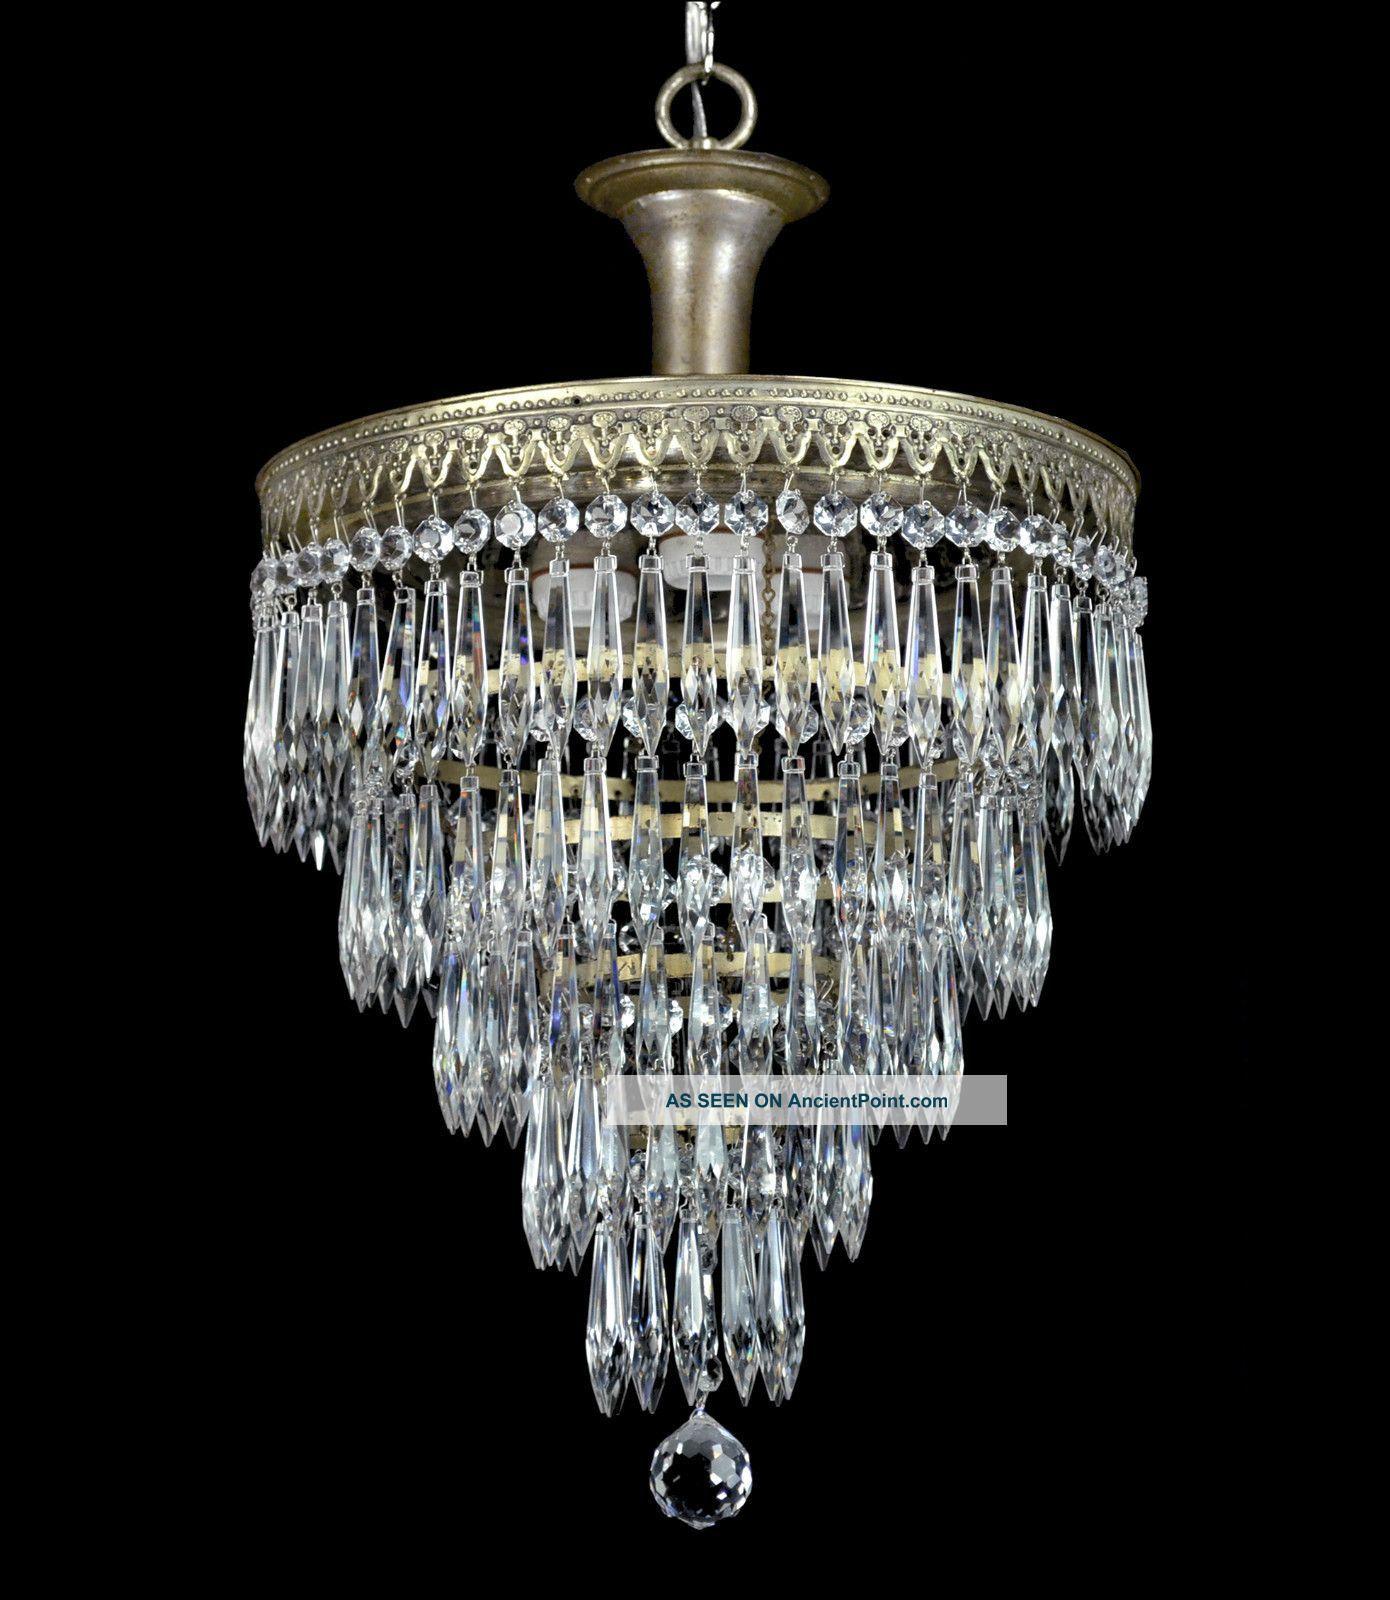 Vintage wedding cake antique chandelier pendant crystal empire art vintage wedding cake antique chandelier pendant crystal empire art deco restored chandeliers fixtures sconces arubaitofo Images